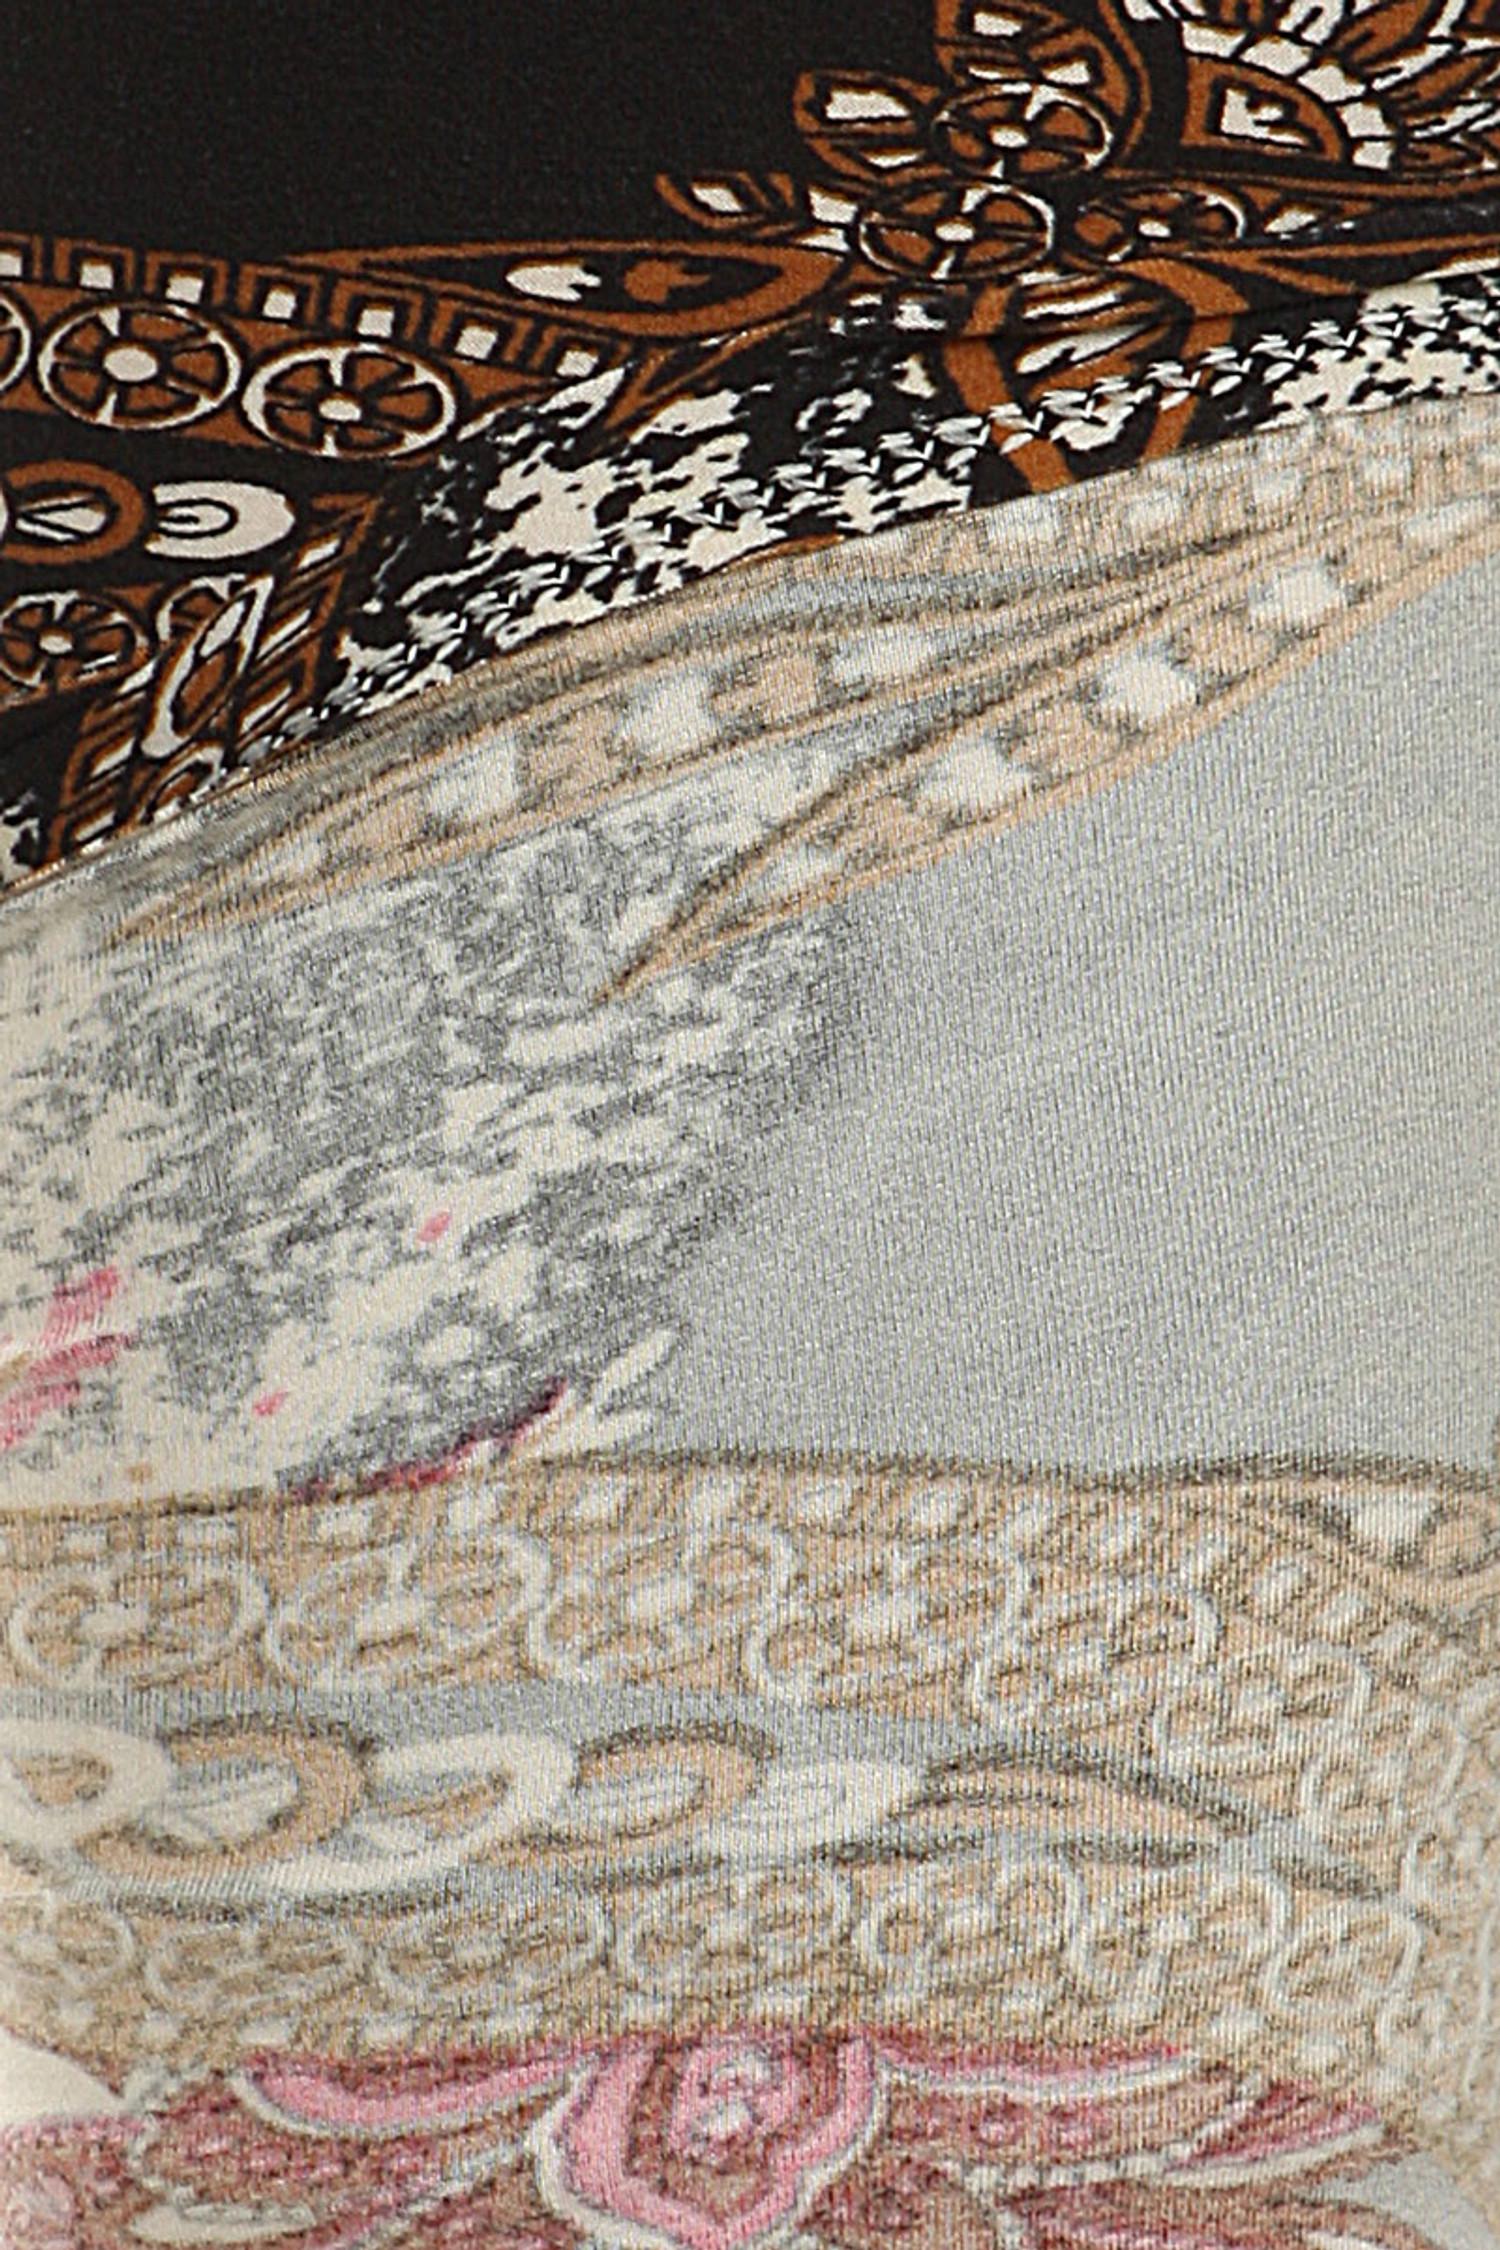 Close-up fabric image of Brushed Berry Plume Plus Size Leggings